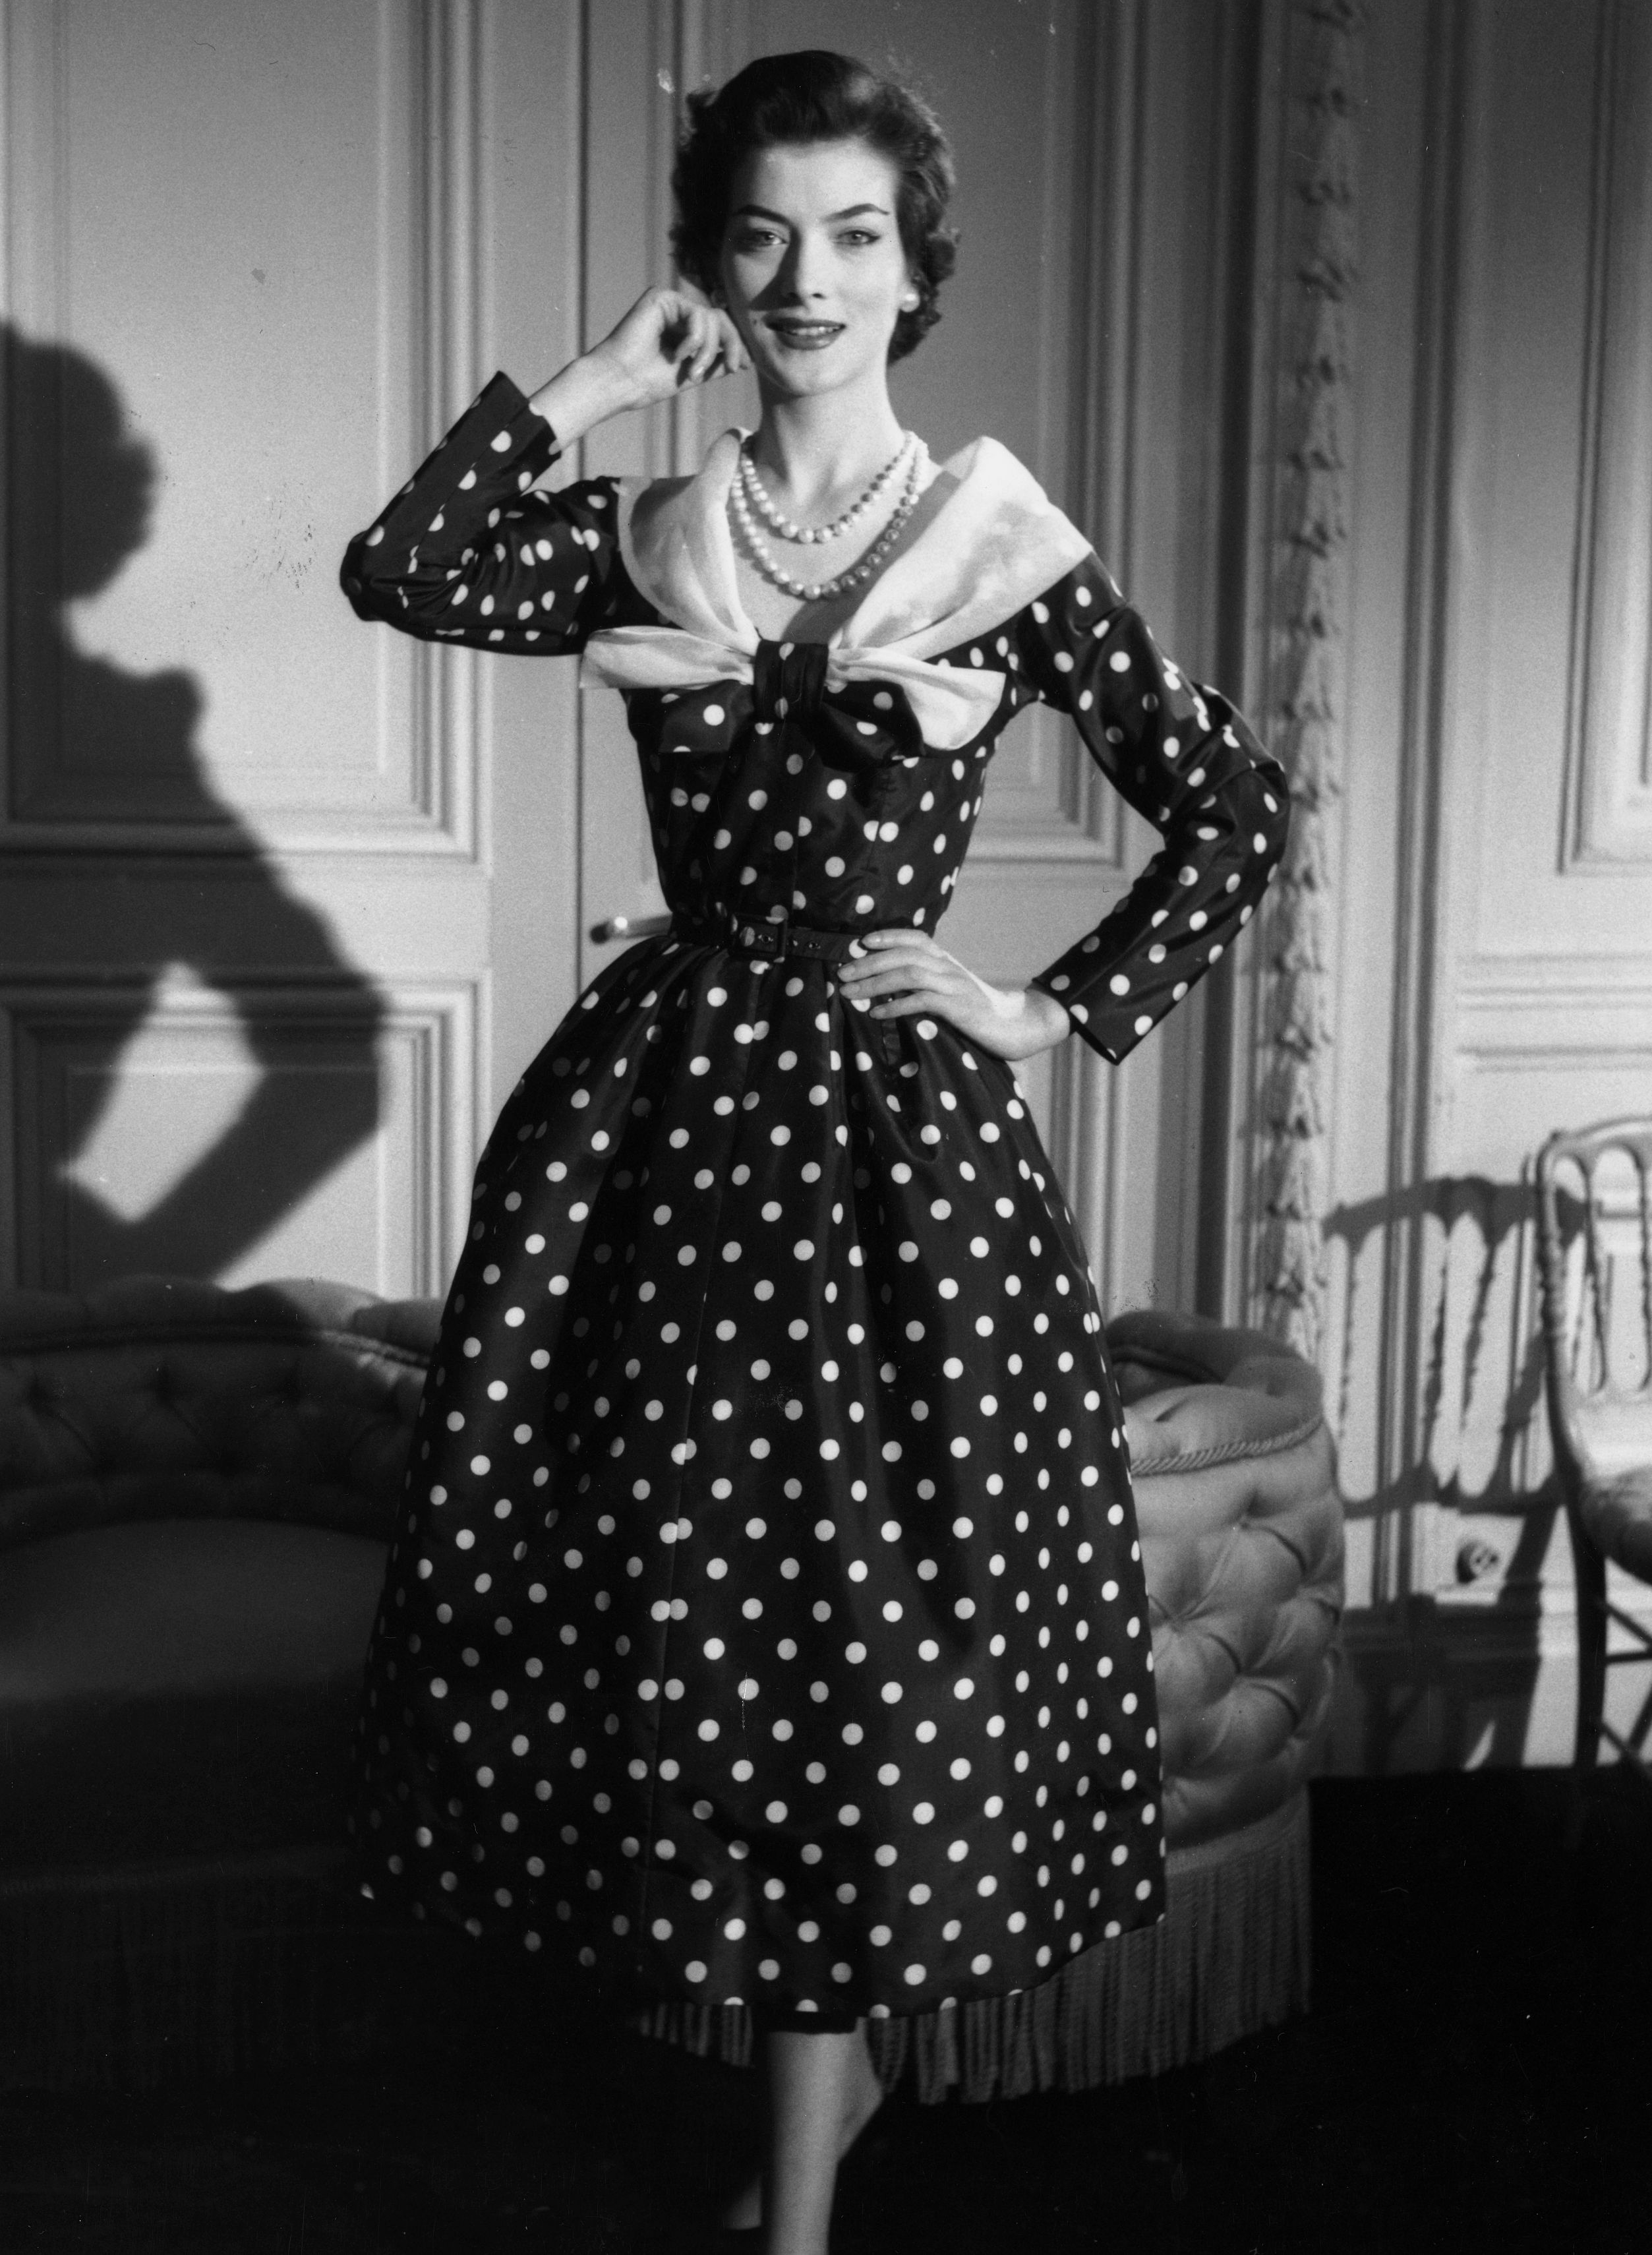 Prezentacja sukni autorstwa Jacques Fath. 1955 r.